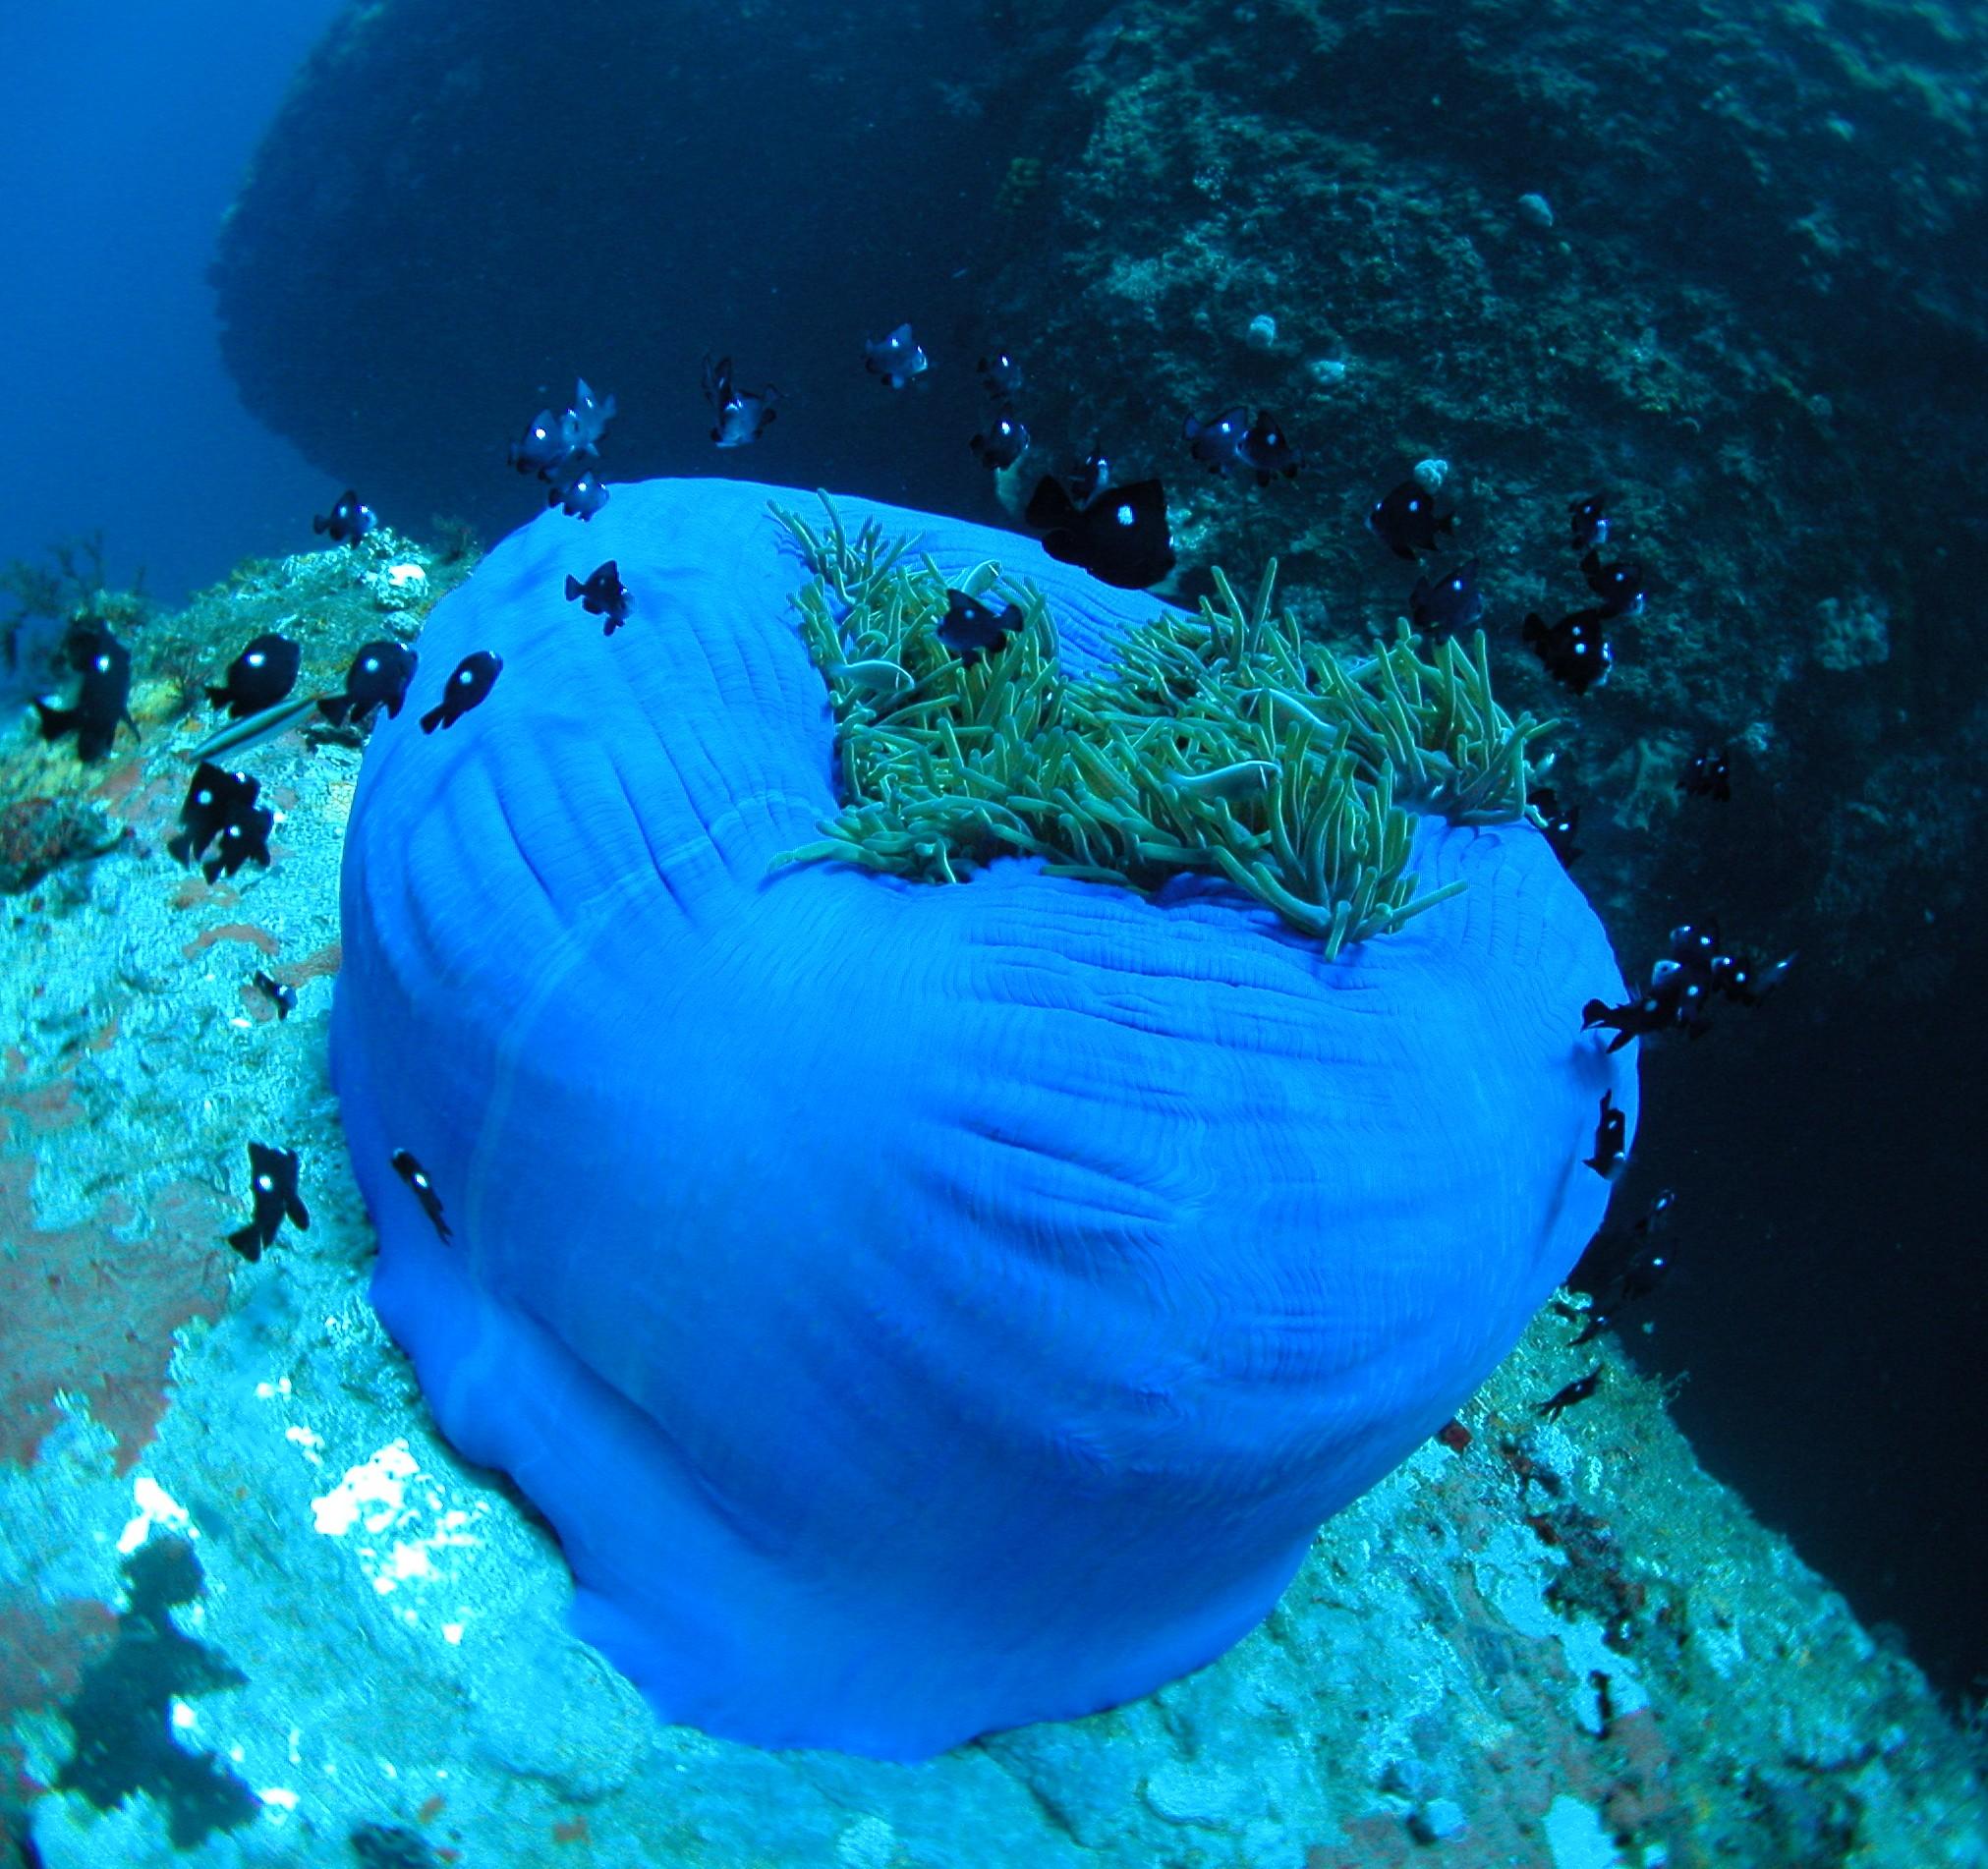 file sea anemone nha wikimedia commons. Black Bedroom Furniture Sets. Home Design Ideas